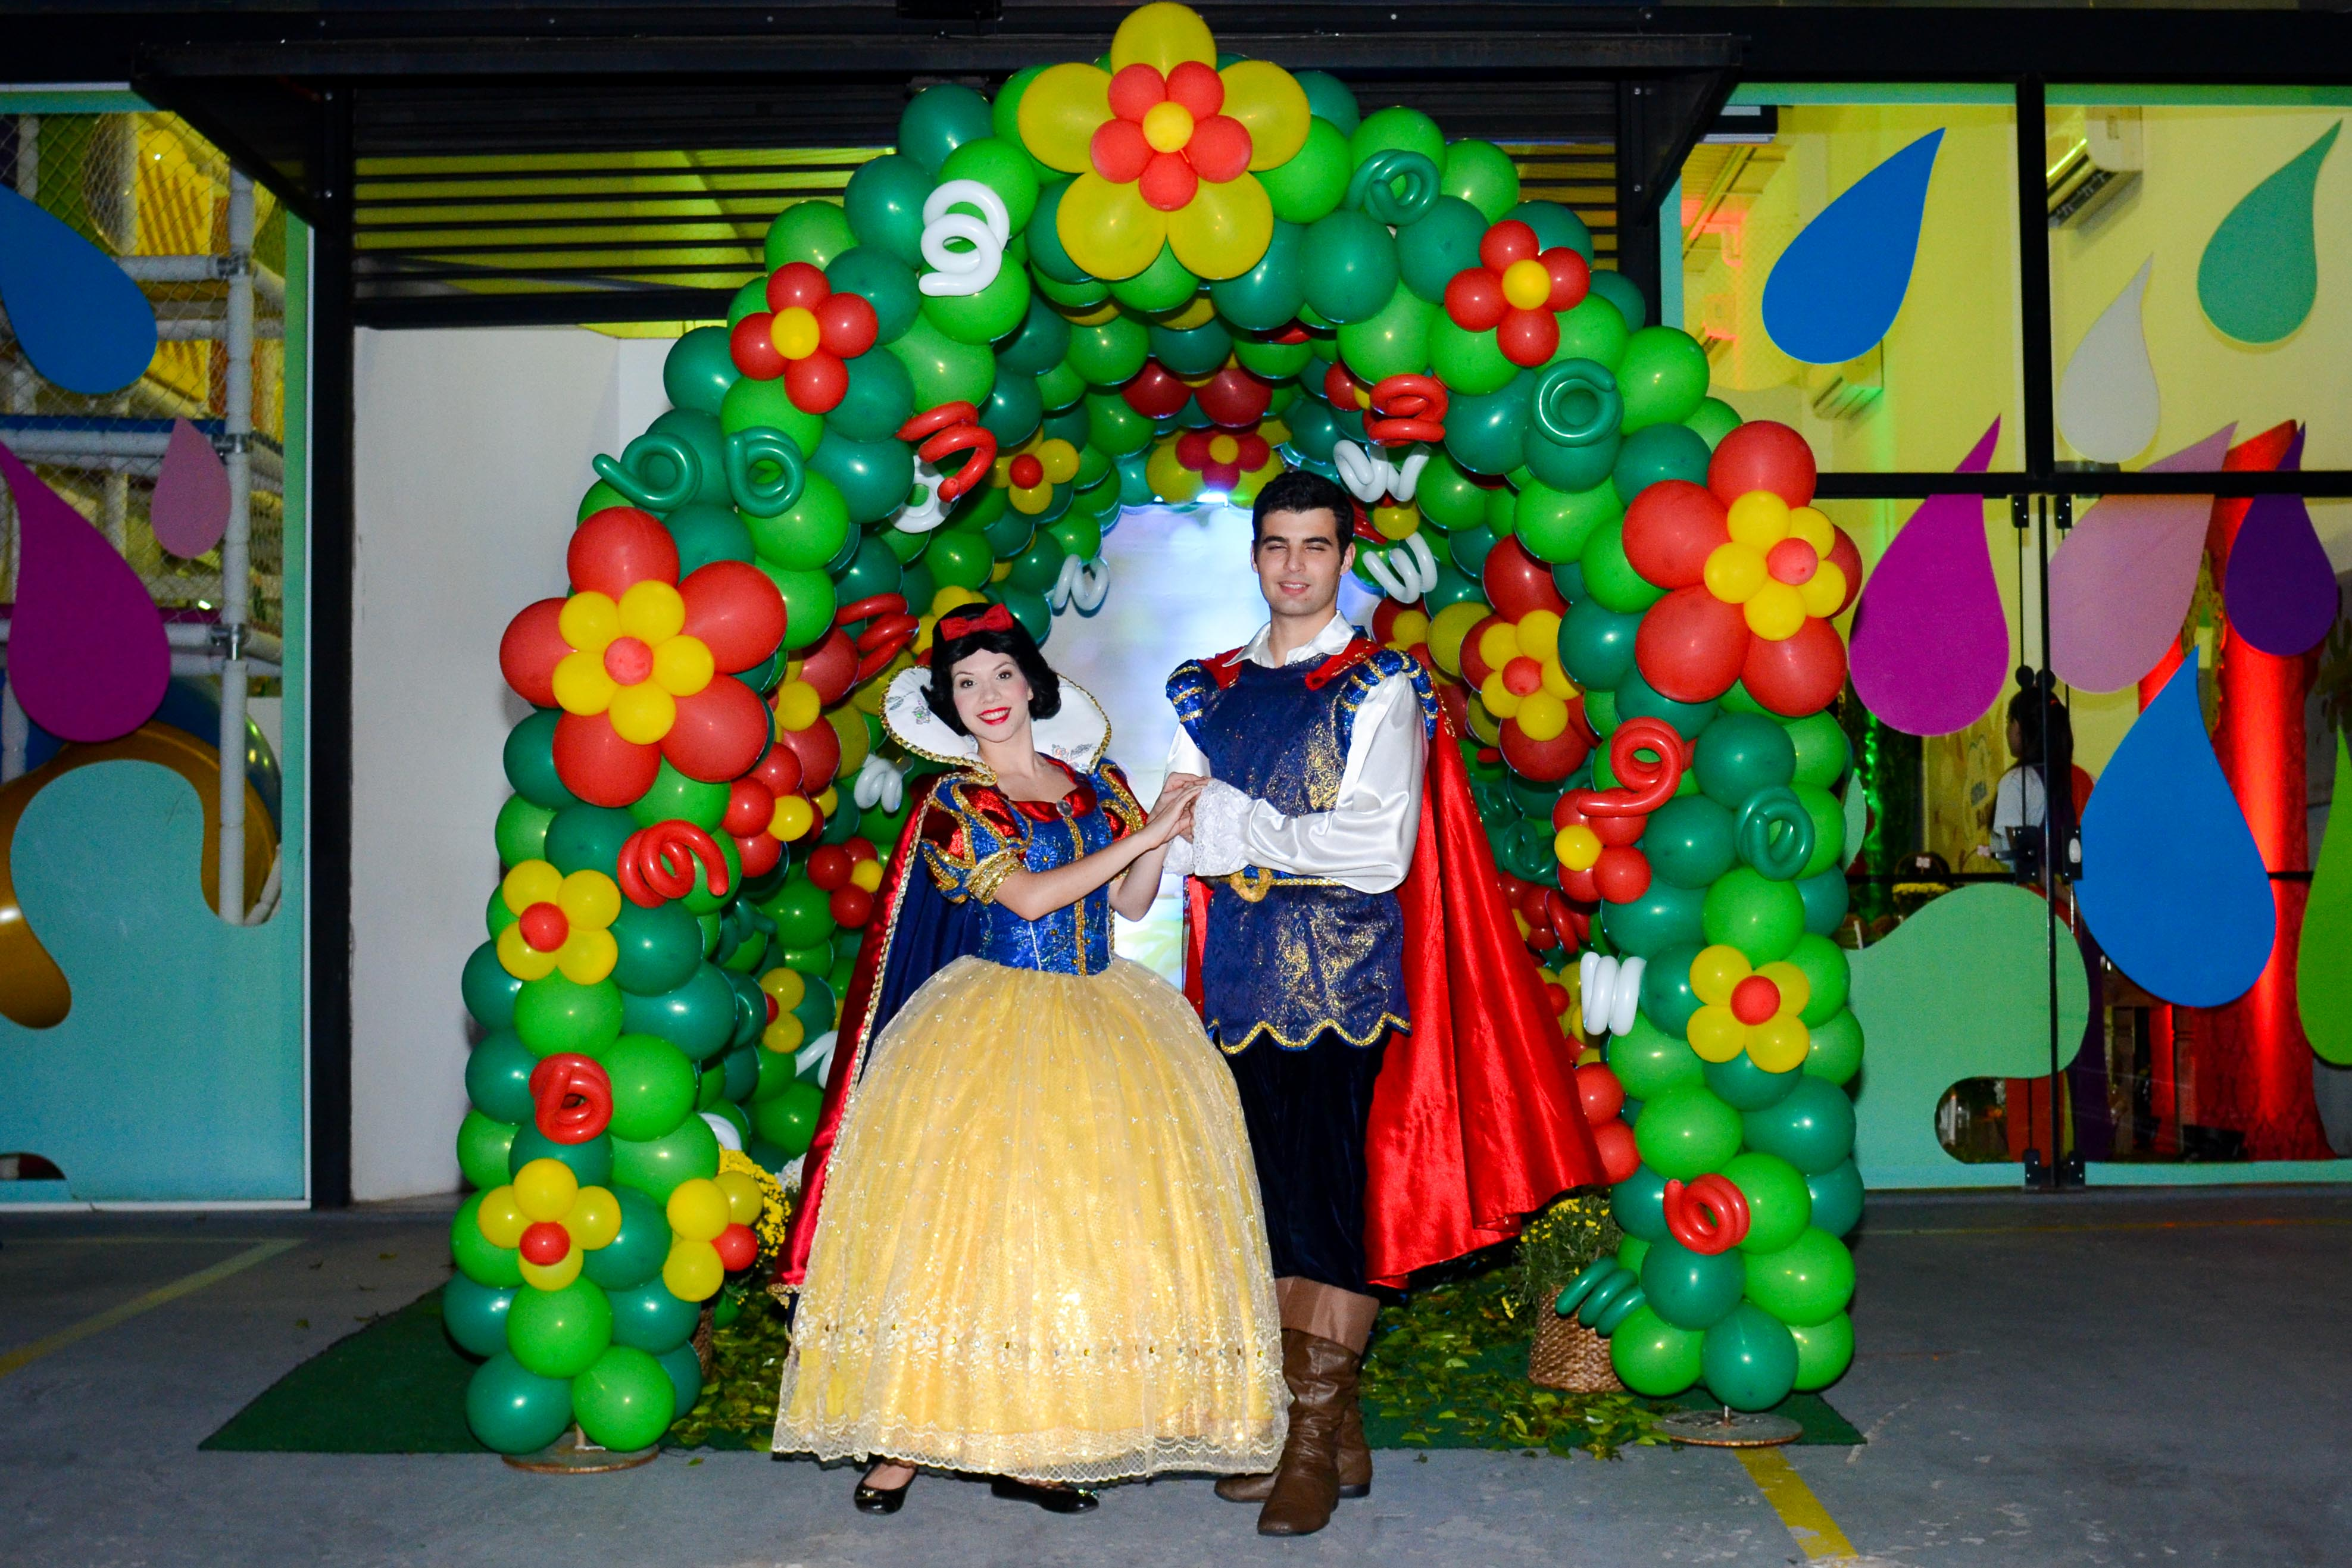 Príncipe e Princesa